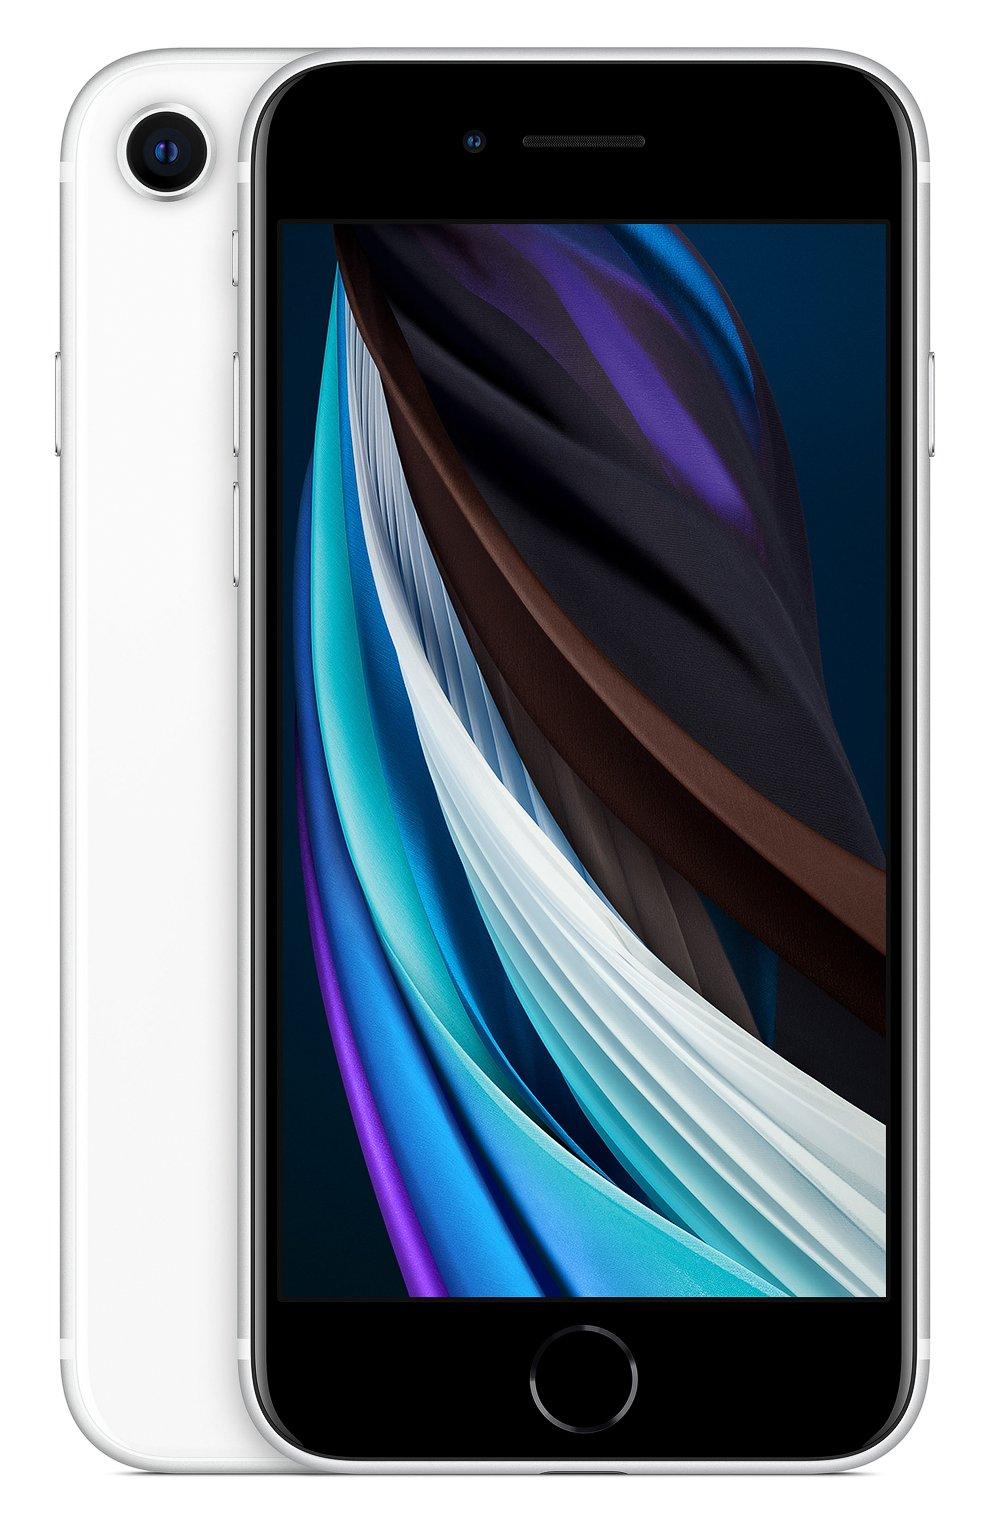 Мужской iphone se (2020) 128gb white APPLE  white цвета, арт. MXD12RU/A | Фото 1